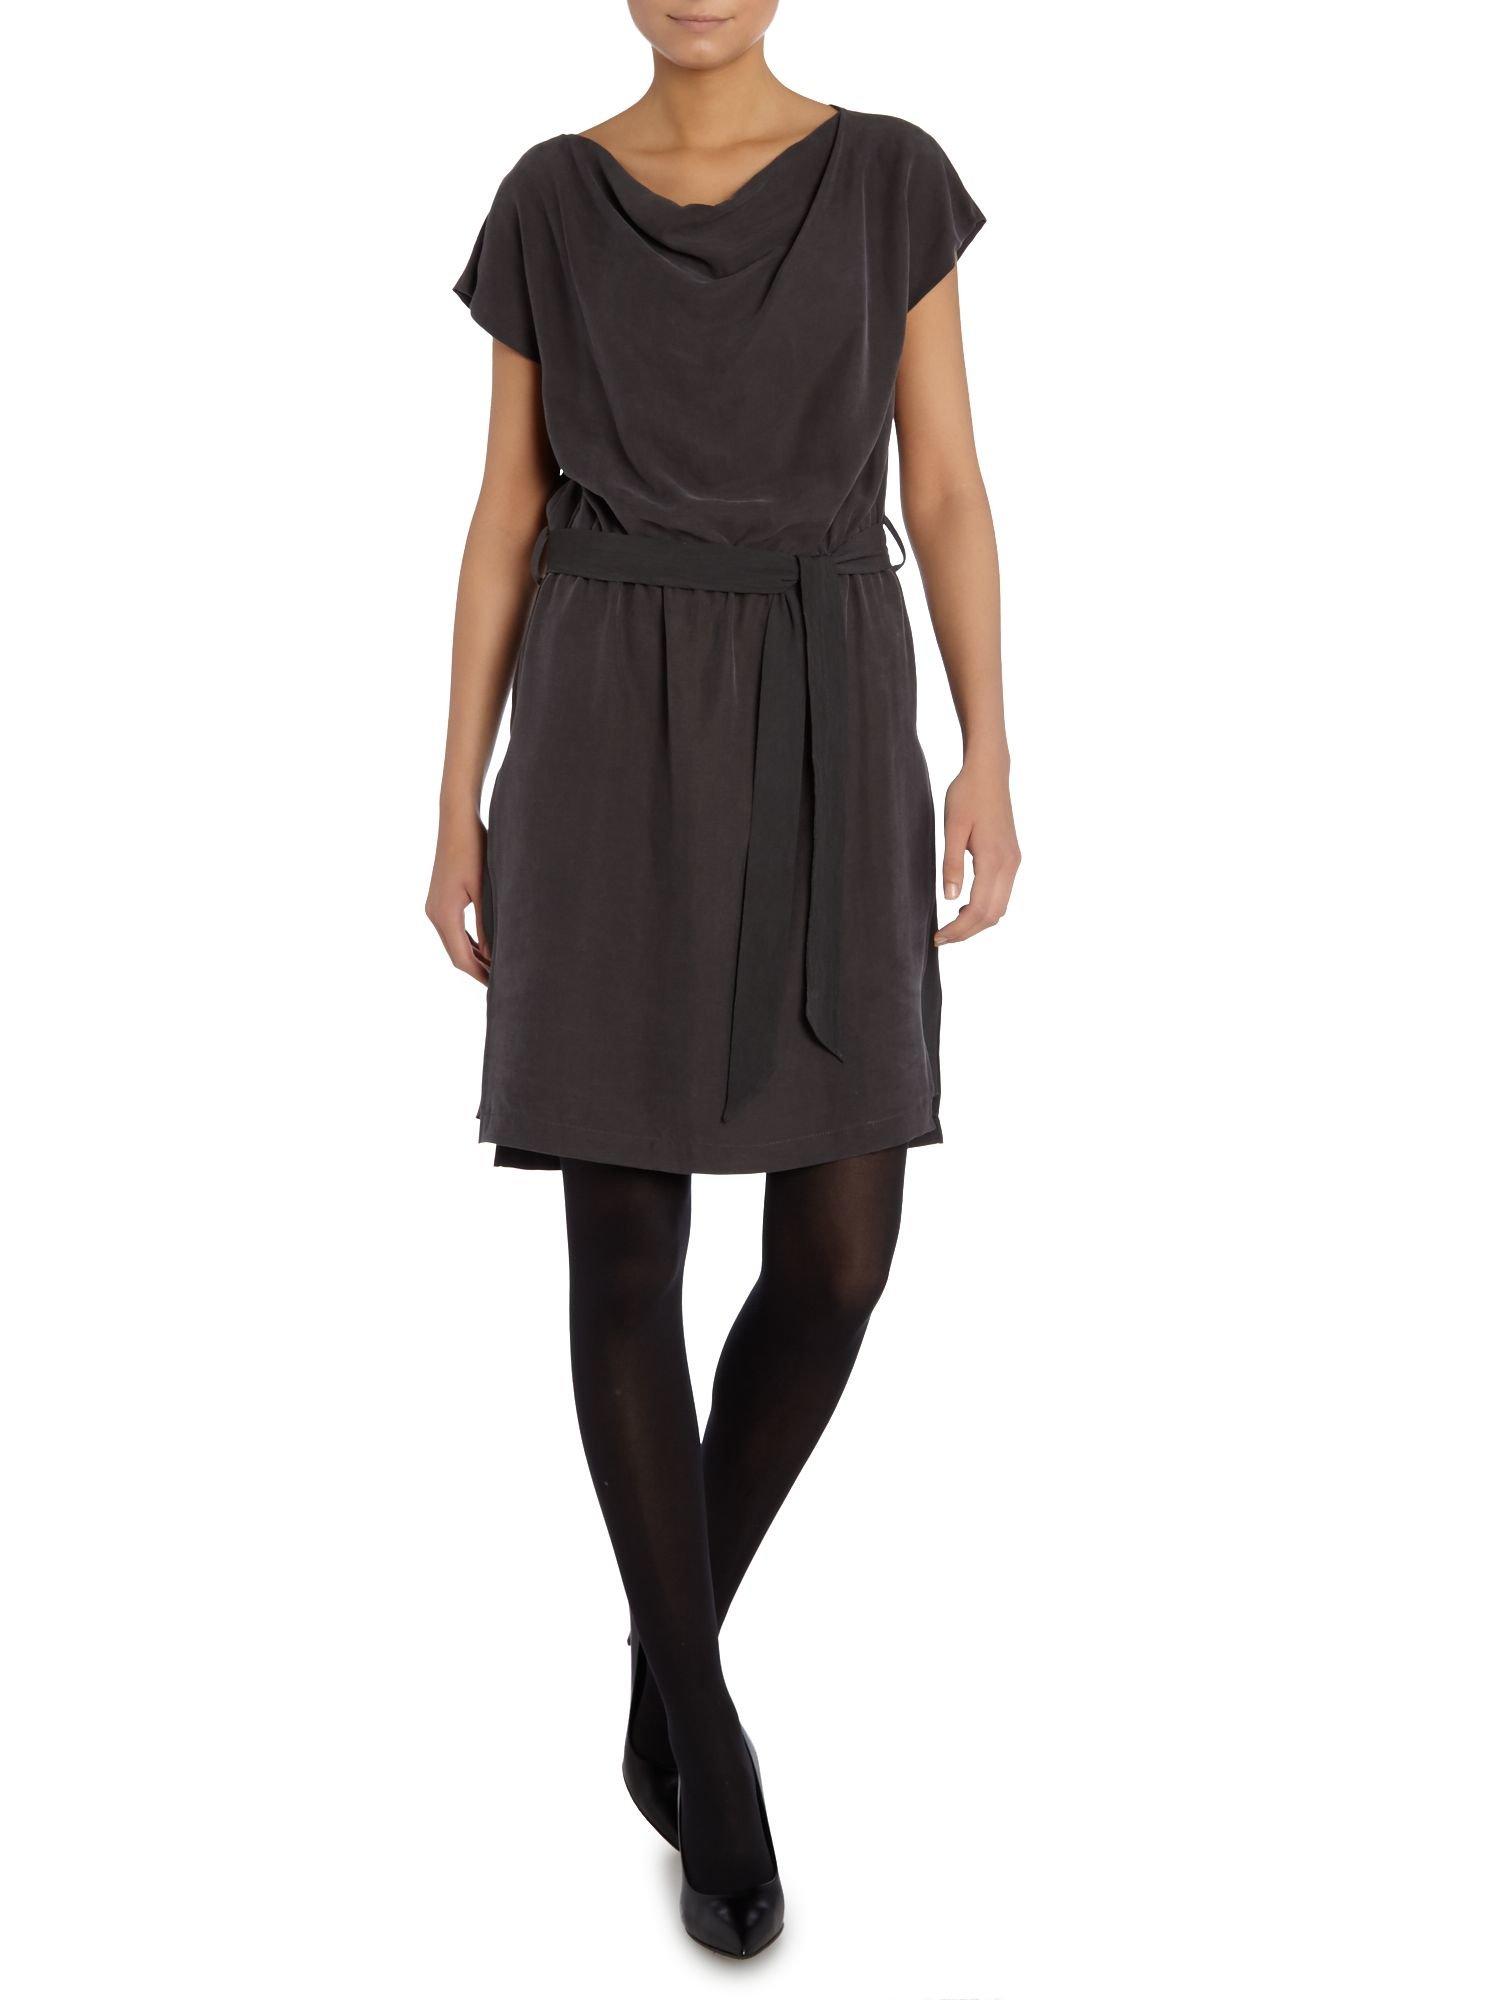 cap sleeve soft belt dress in gray charcoal lyst